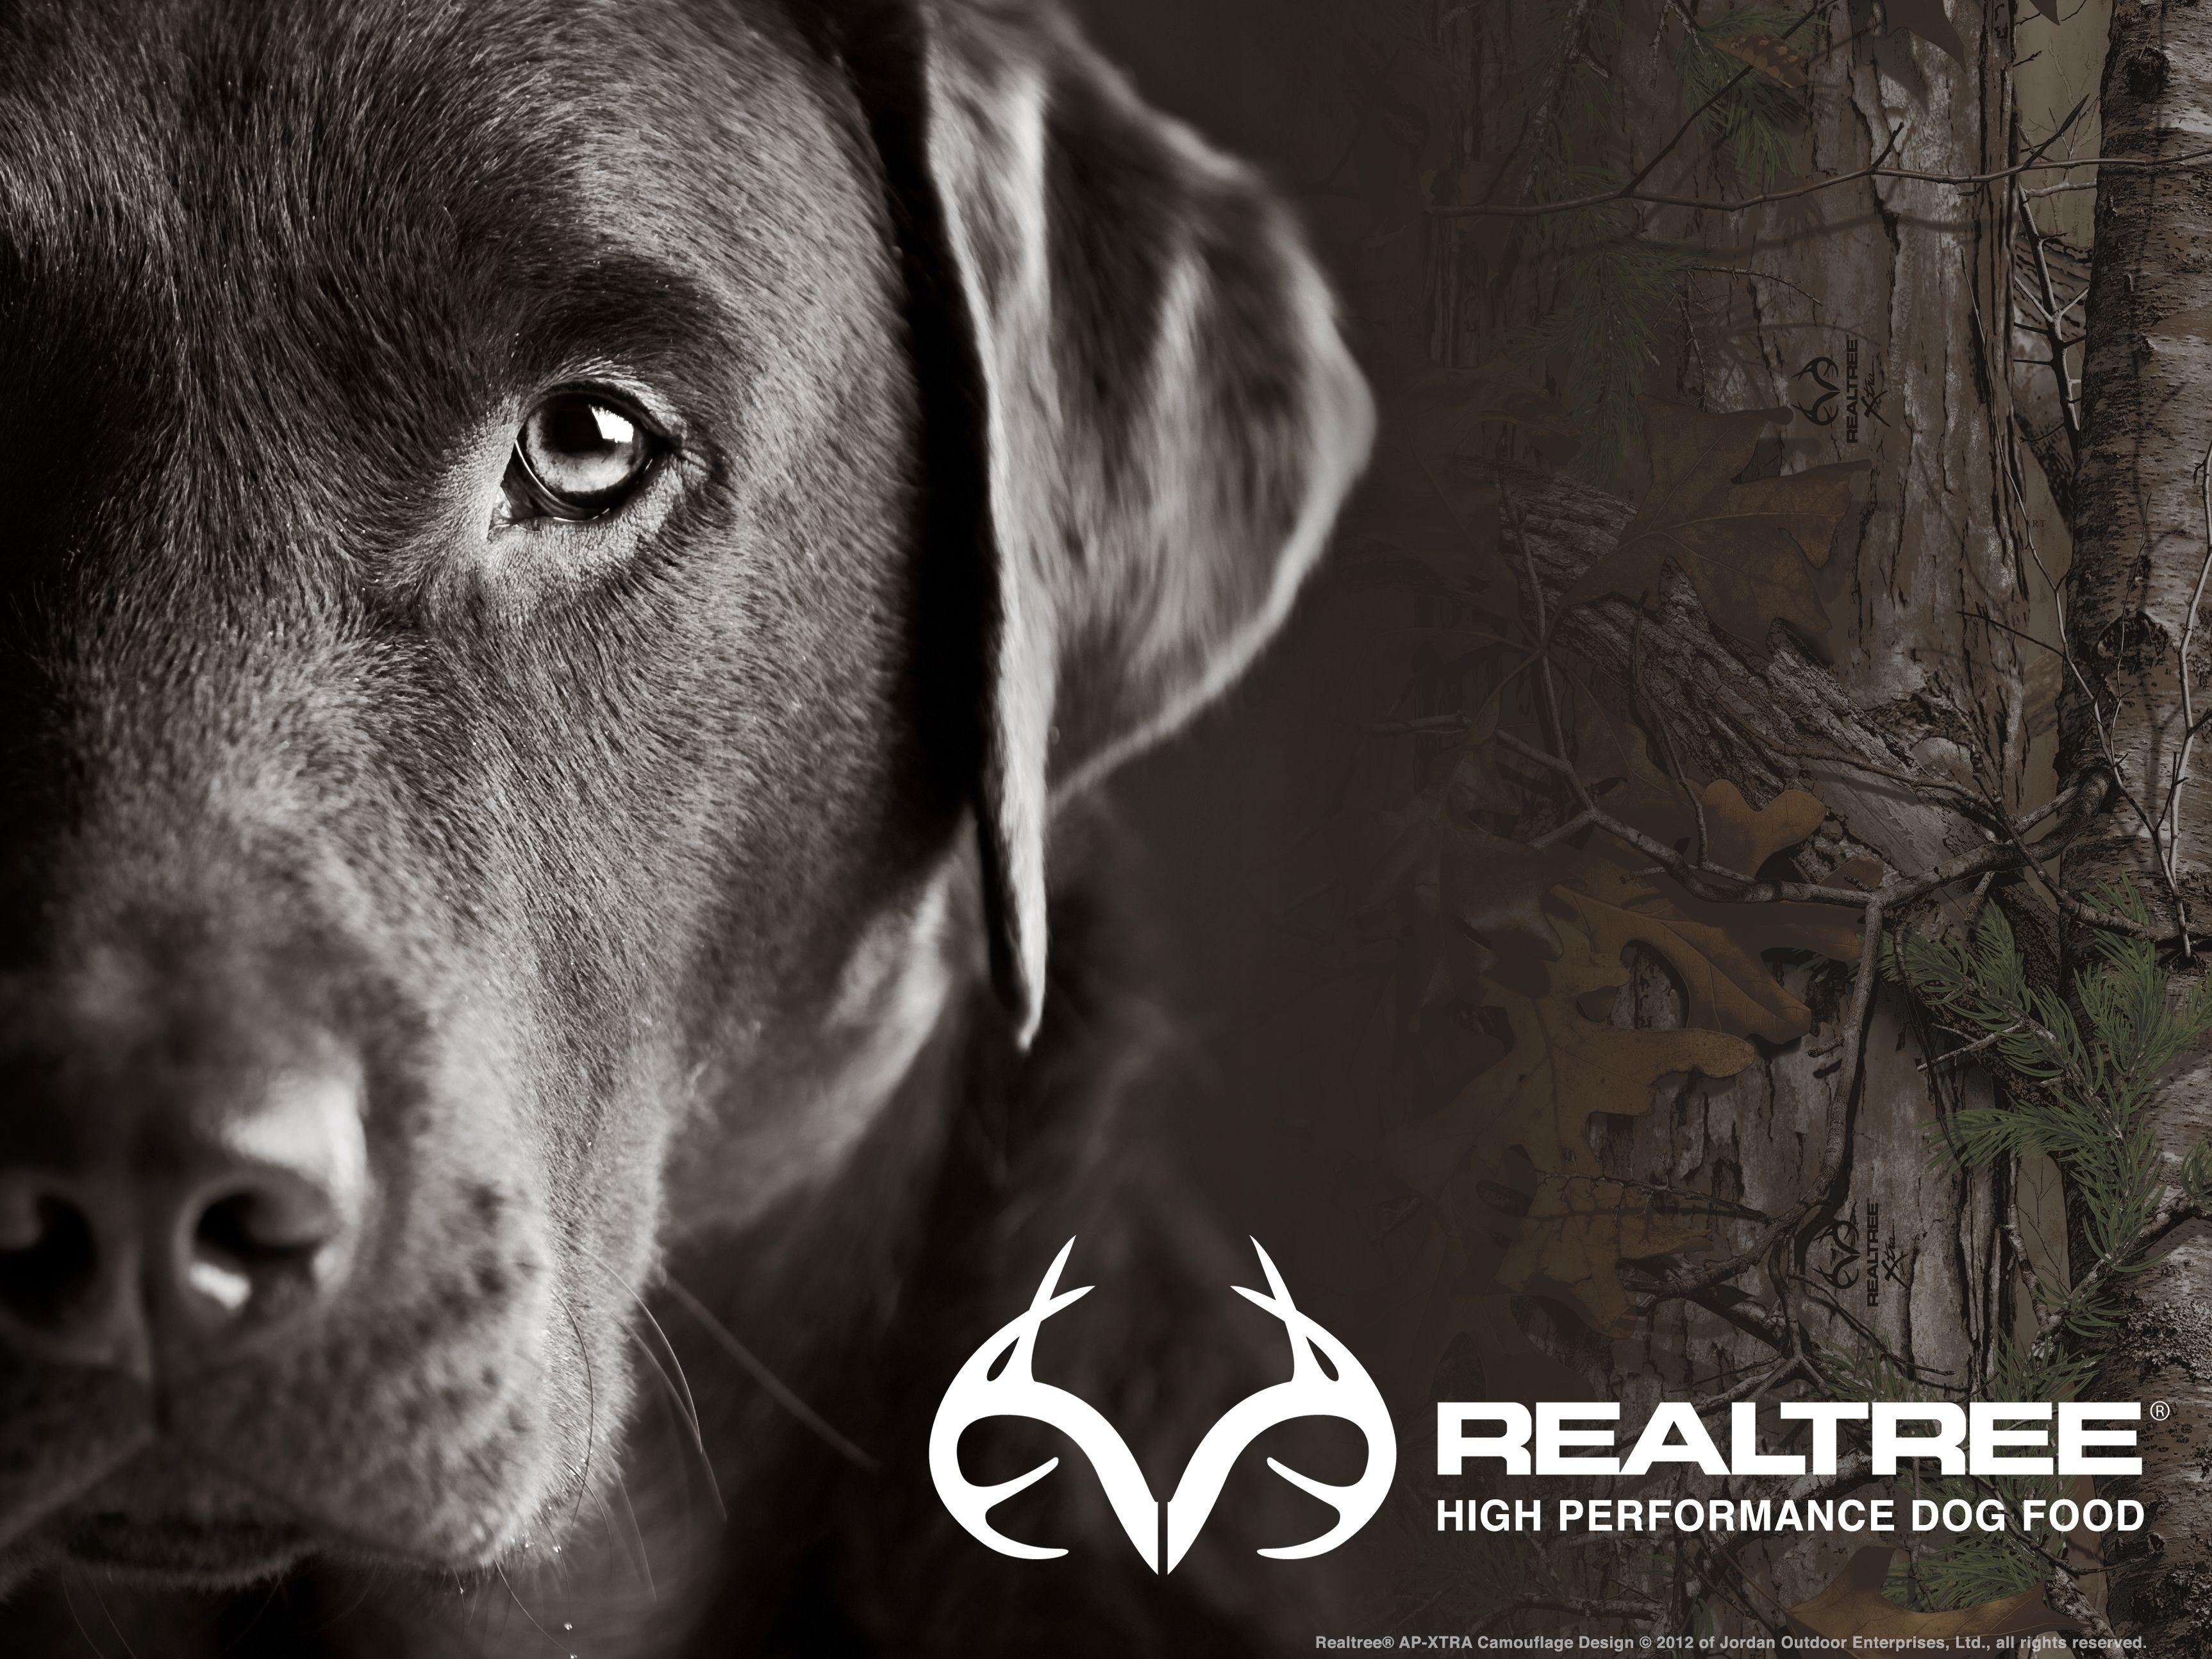 Fullscreen Realtree® HIgh Performance Dog Food Wallpaper